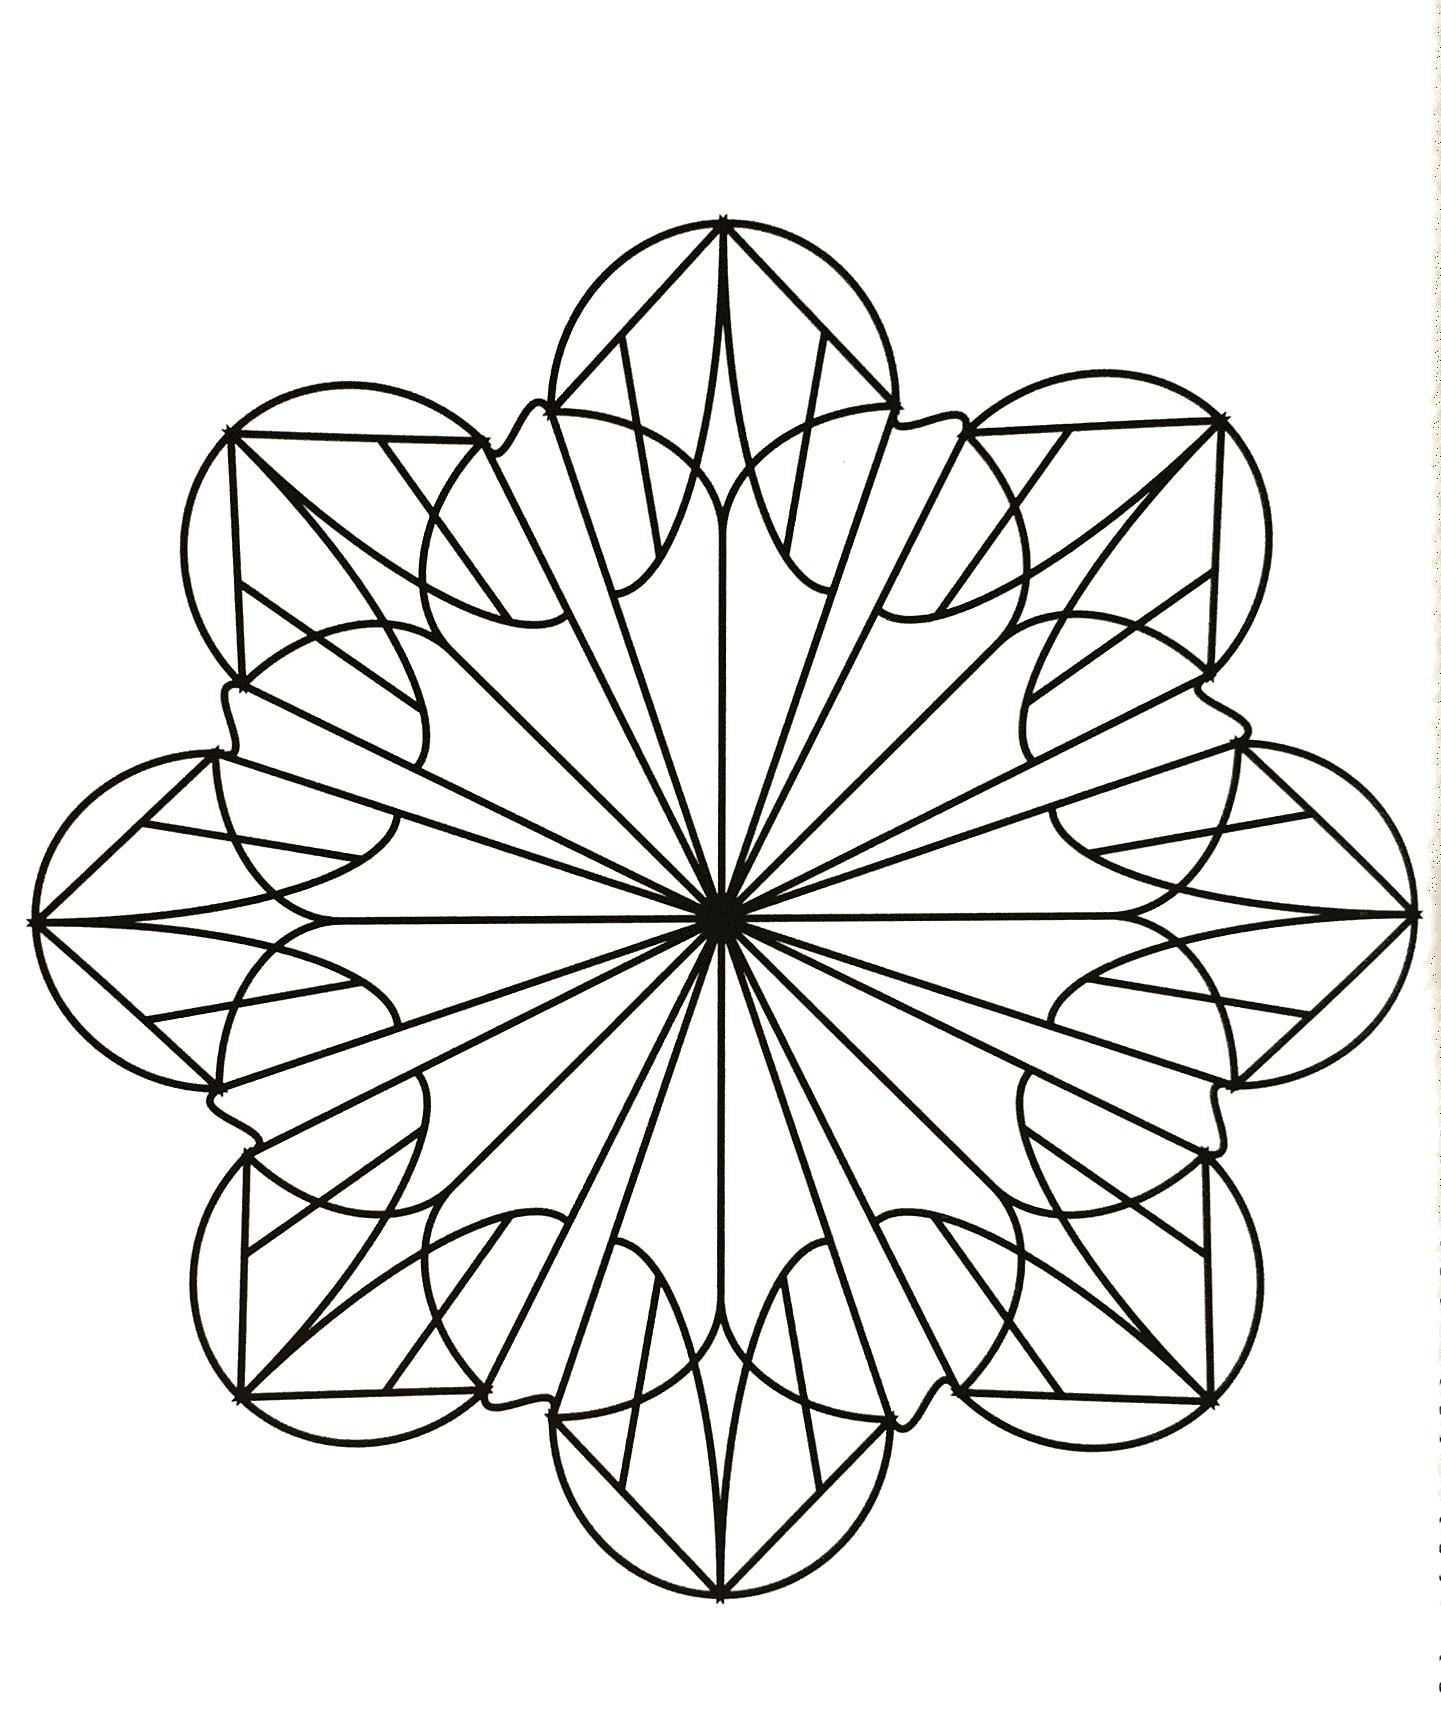 Facile mandala fleur coloriage mandalas coloriages - Dessin fleur facile ...